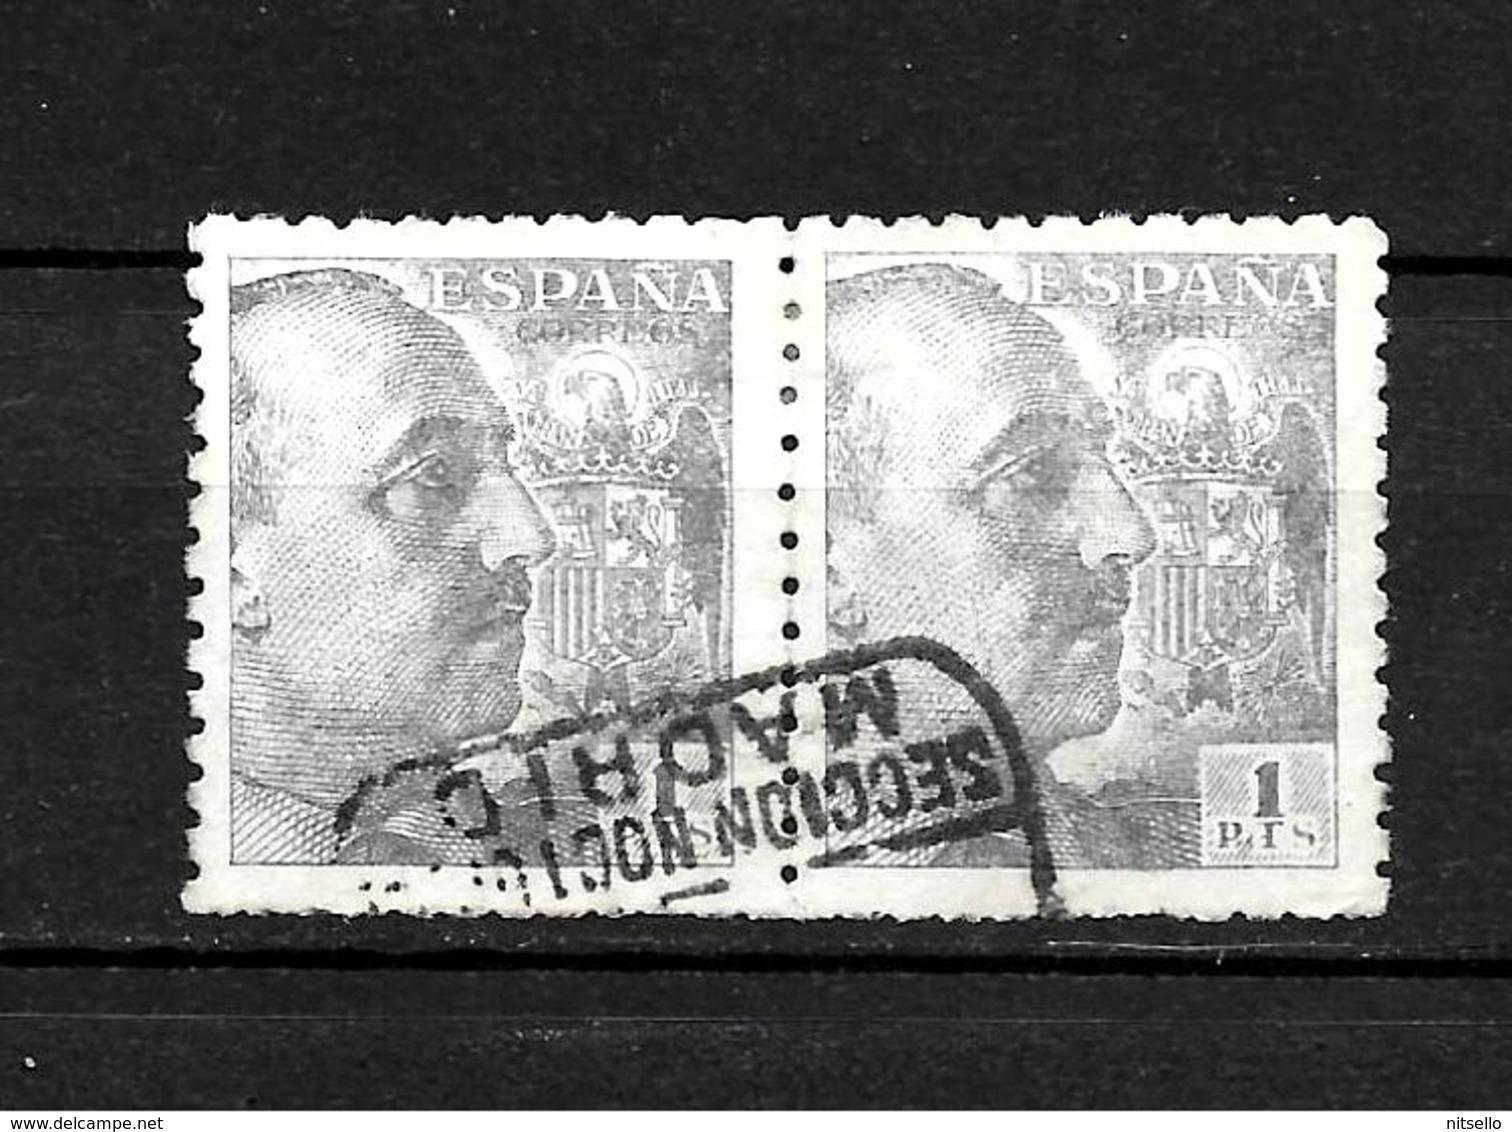 LOTE 1995 ///  (CS015)  ESPAÑA EDIFIL Nº: 931 CERTIFICADO   ¡¡¡ OFERTA - LIQUIDATION !!! JE LIQUIDE !!! - 1931-50 Gebraucht